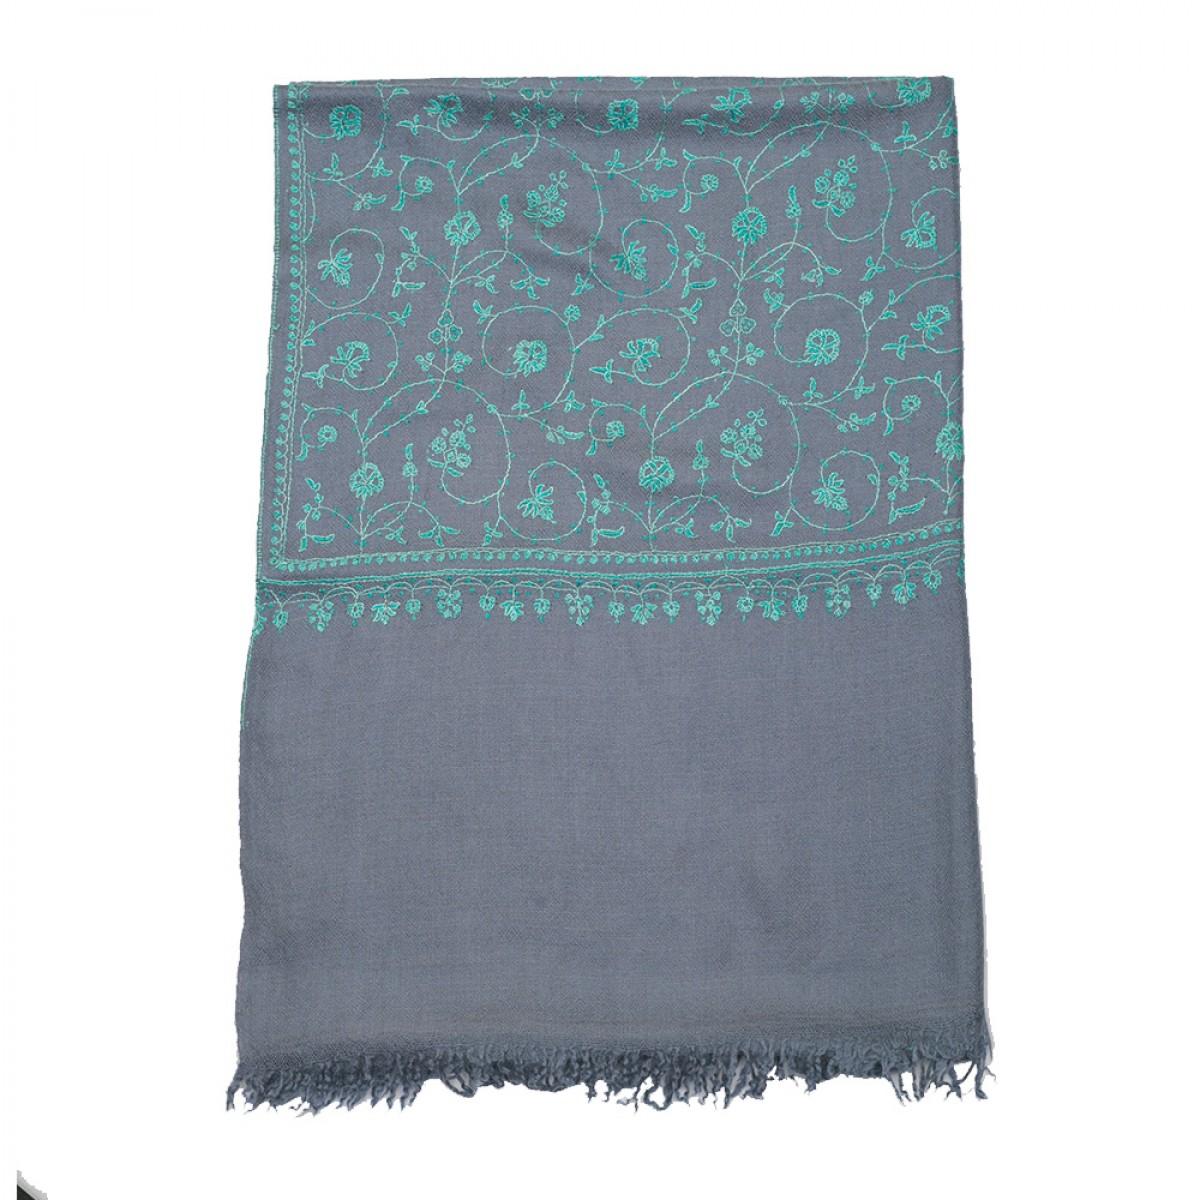 Embroidered Pashmina Stole - Slate Grey